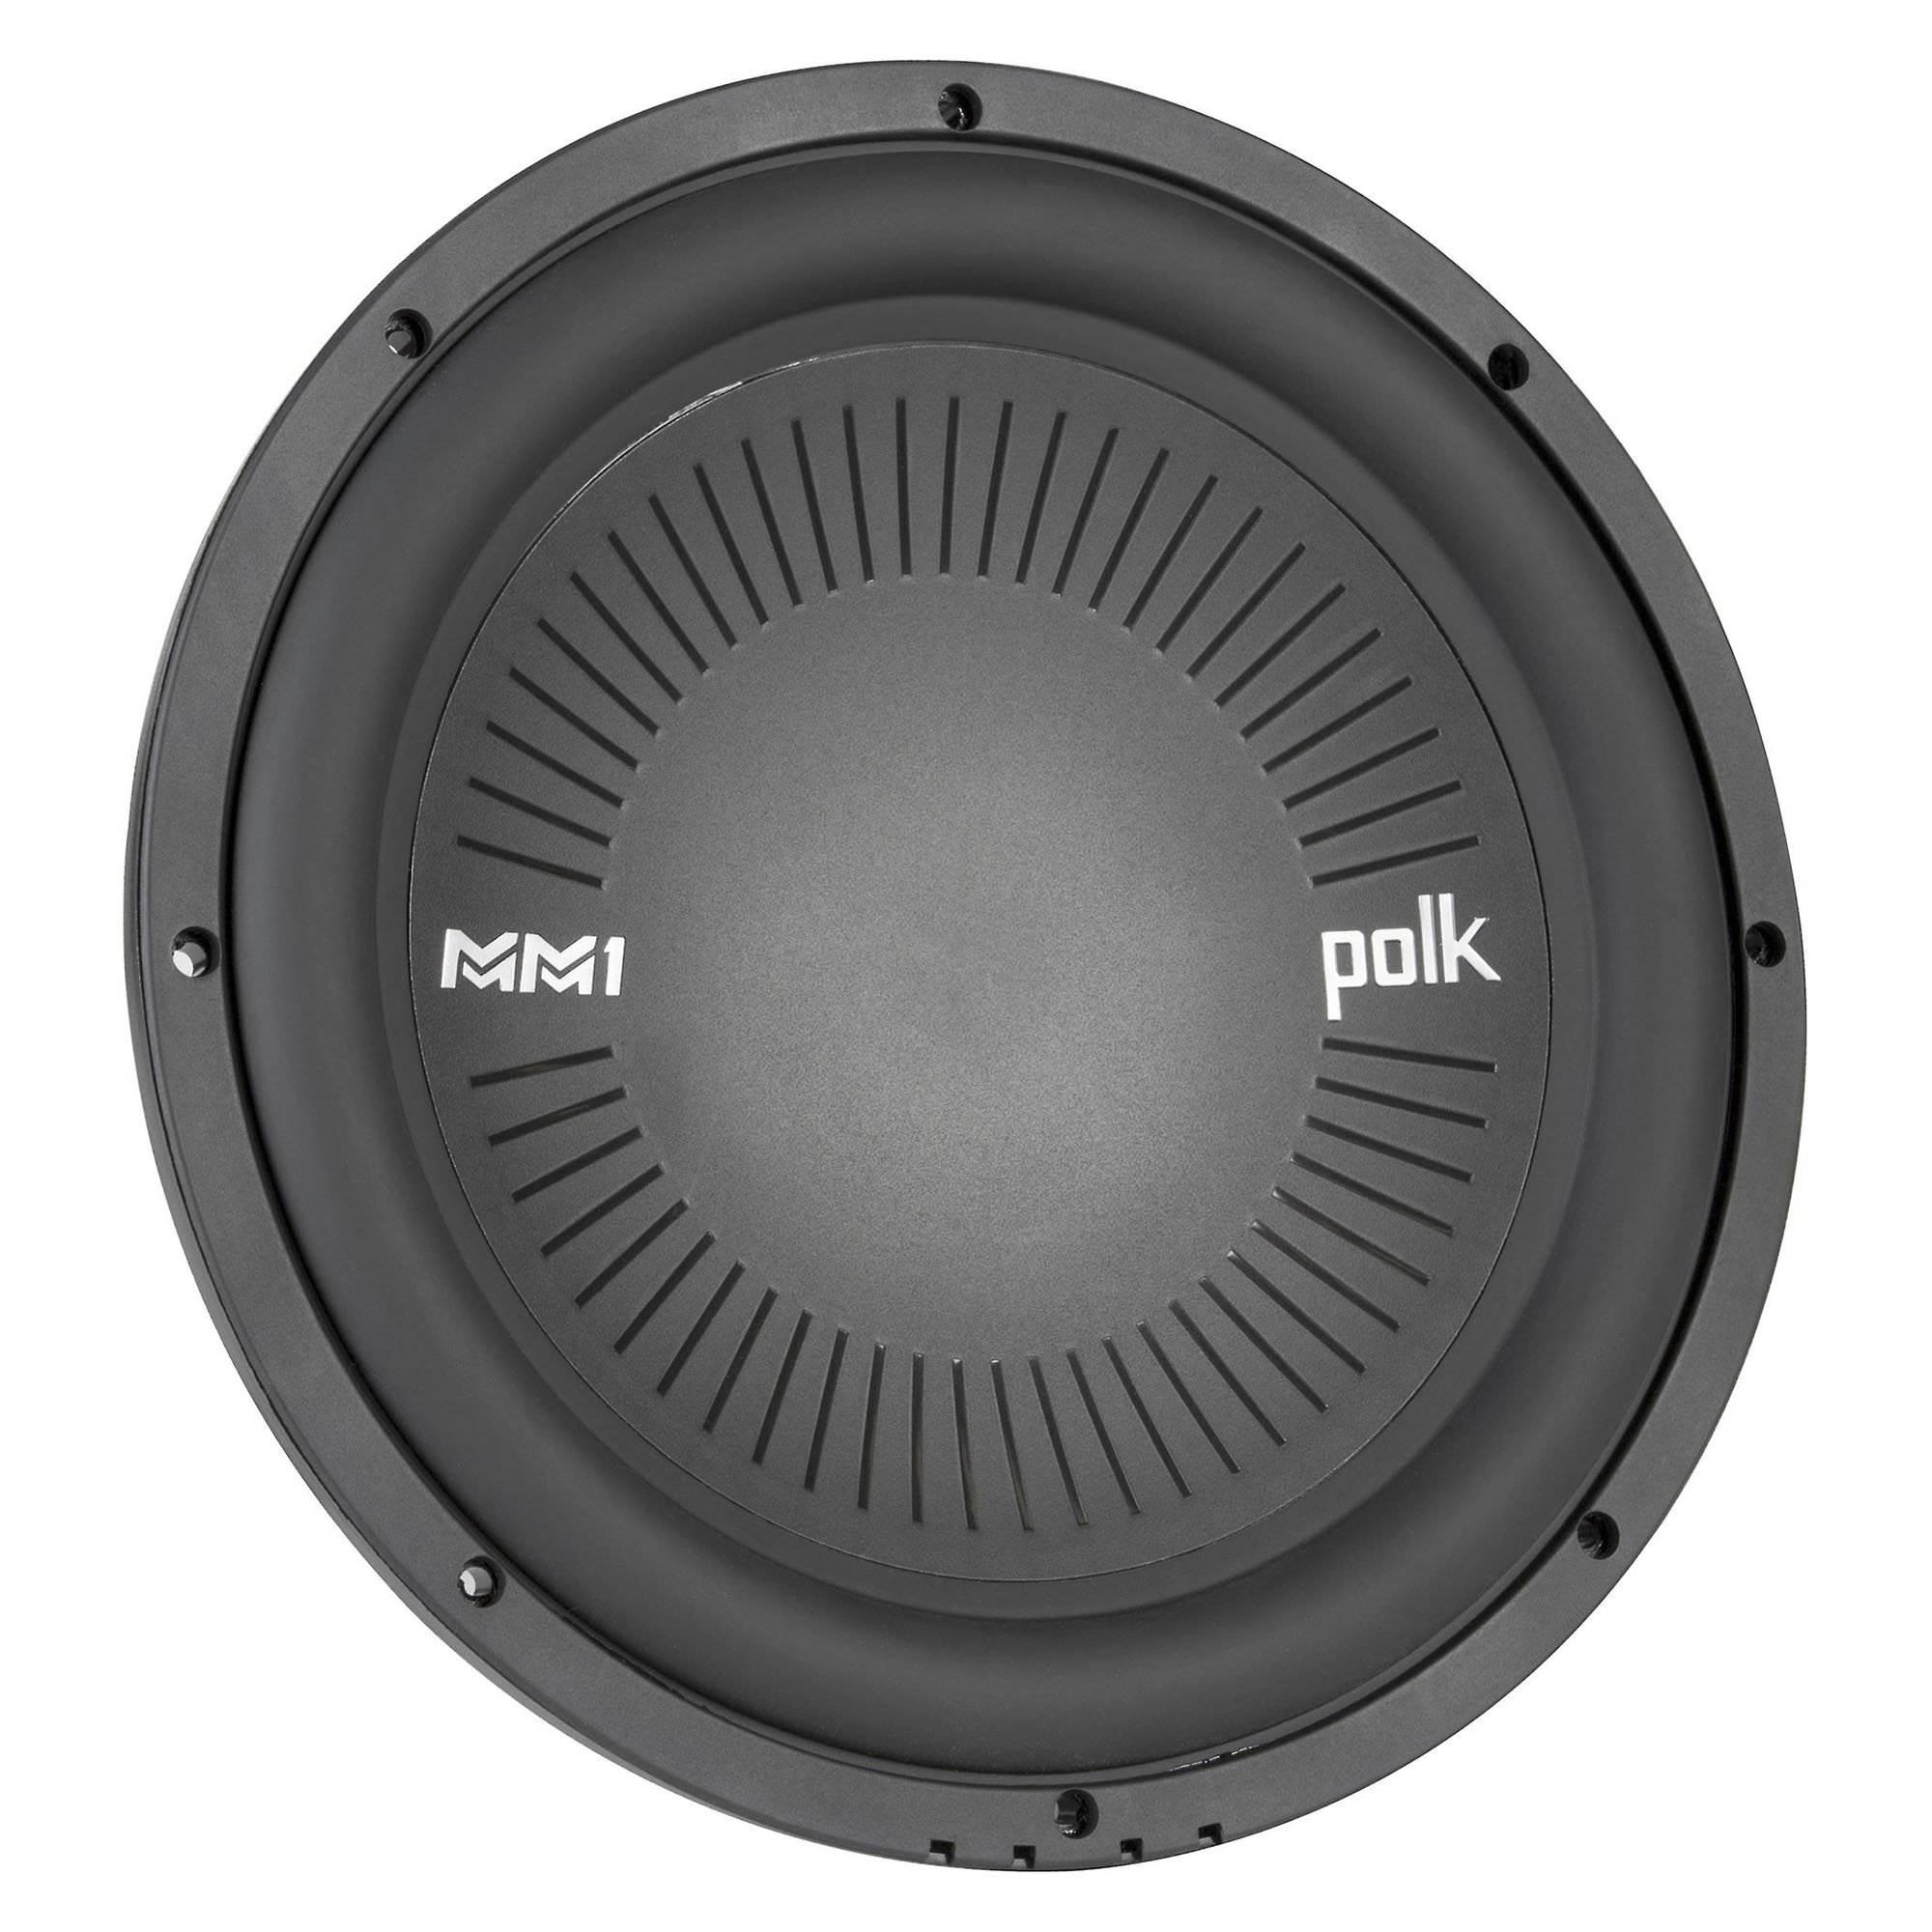 Polk MM1 Series 10 1200W 4 Ohm Single Voice Coil Marine